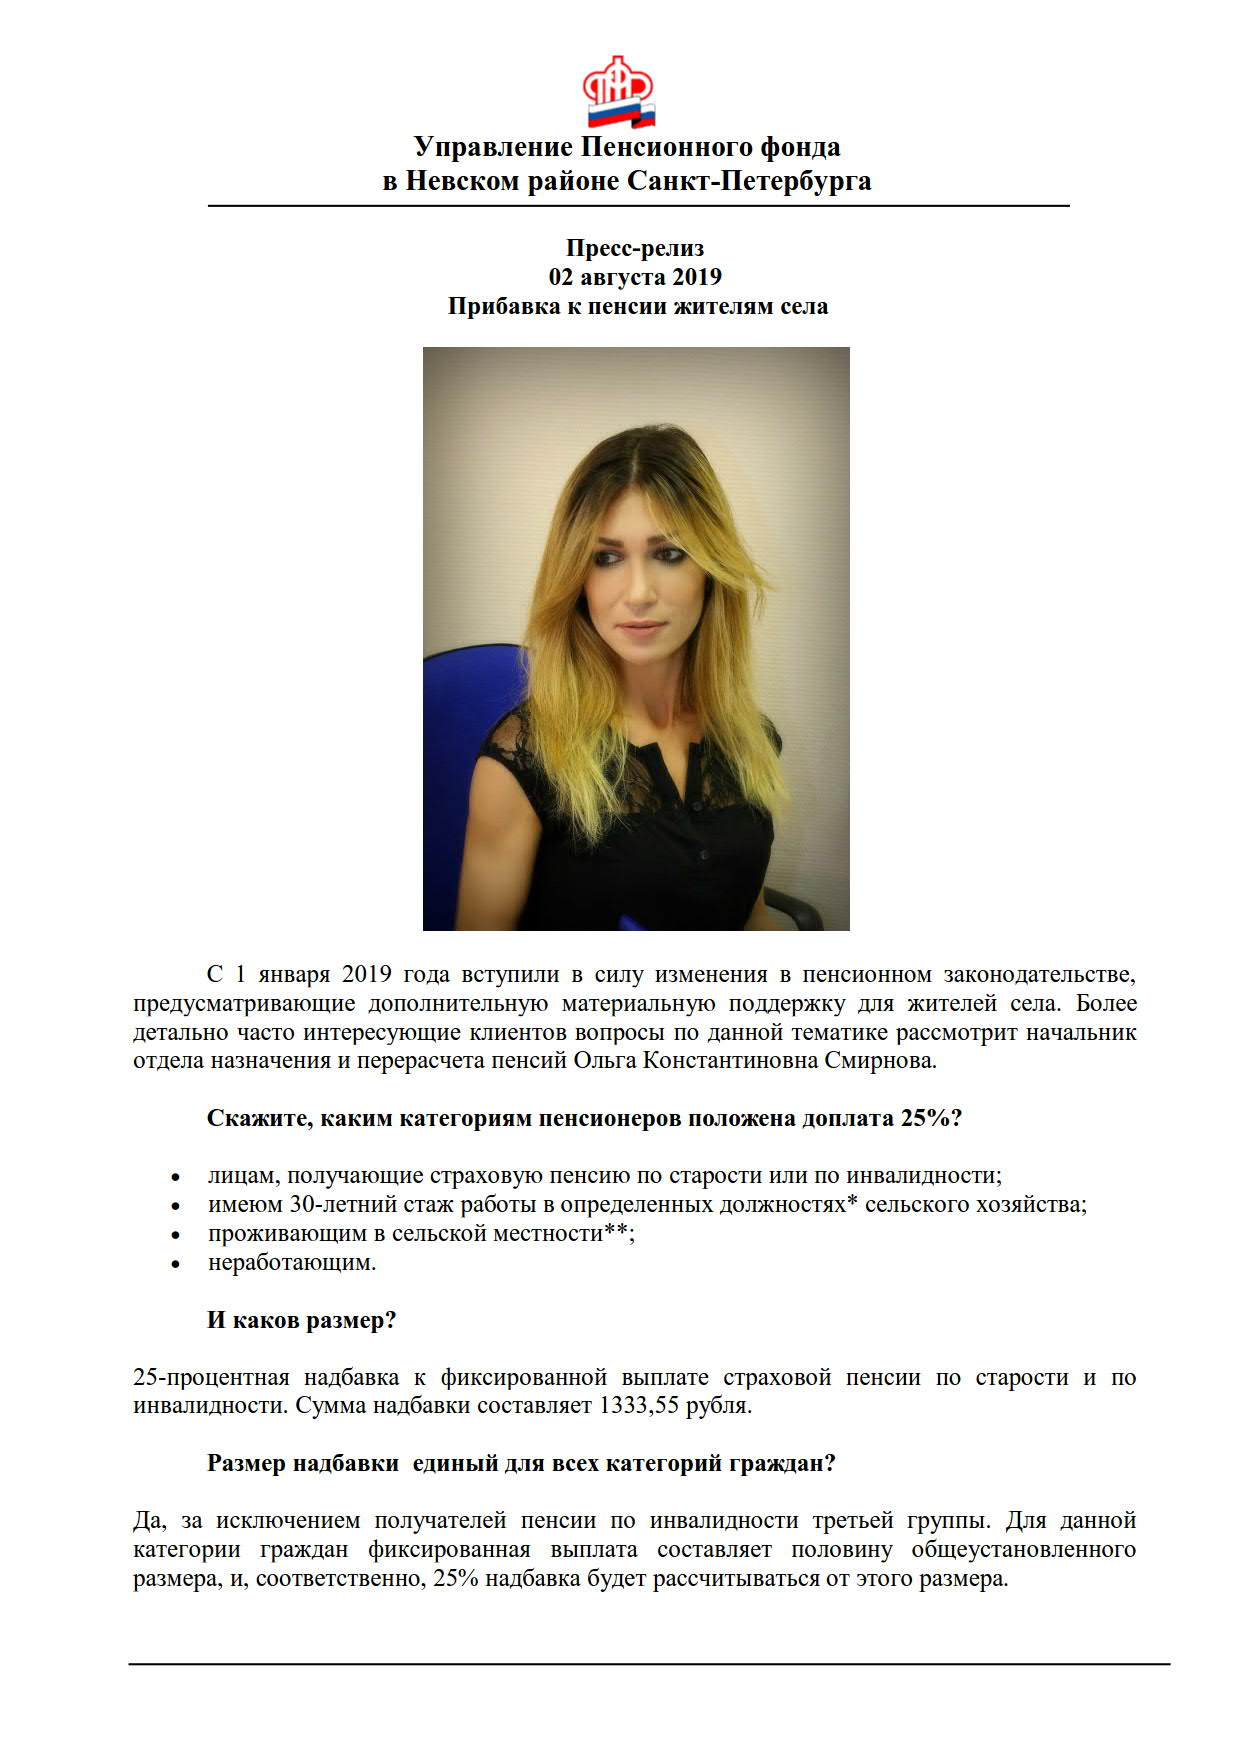 Прибавка к пенсии жителям села_1